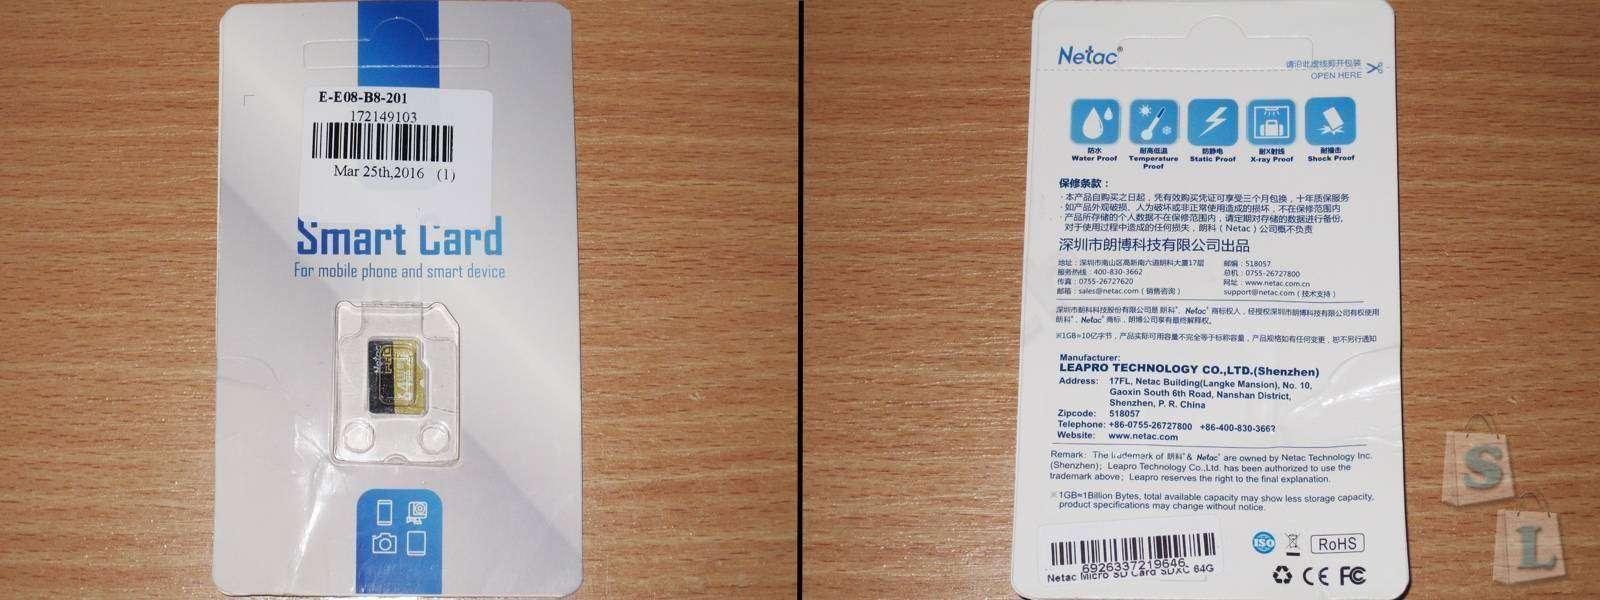 GearBest: Netac P500 64GB Micro SD, маленький обзор маленькой карты памяти